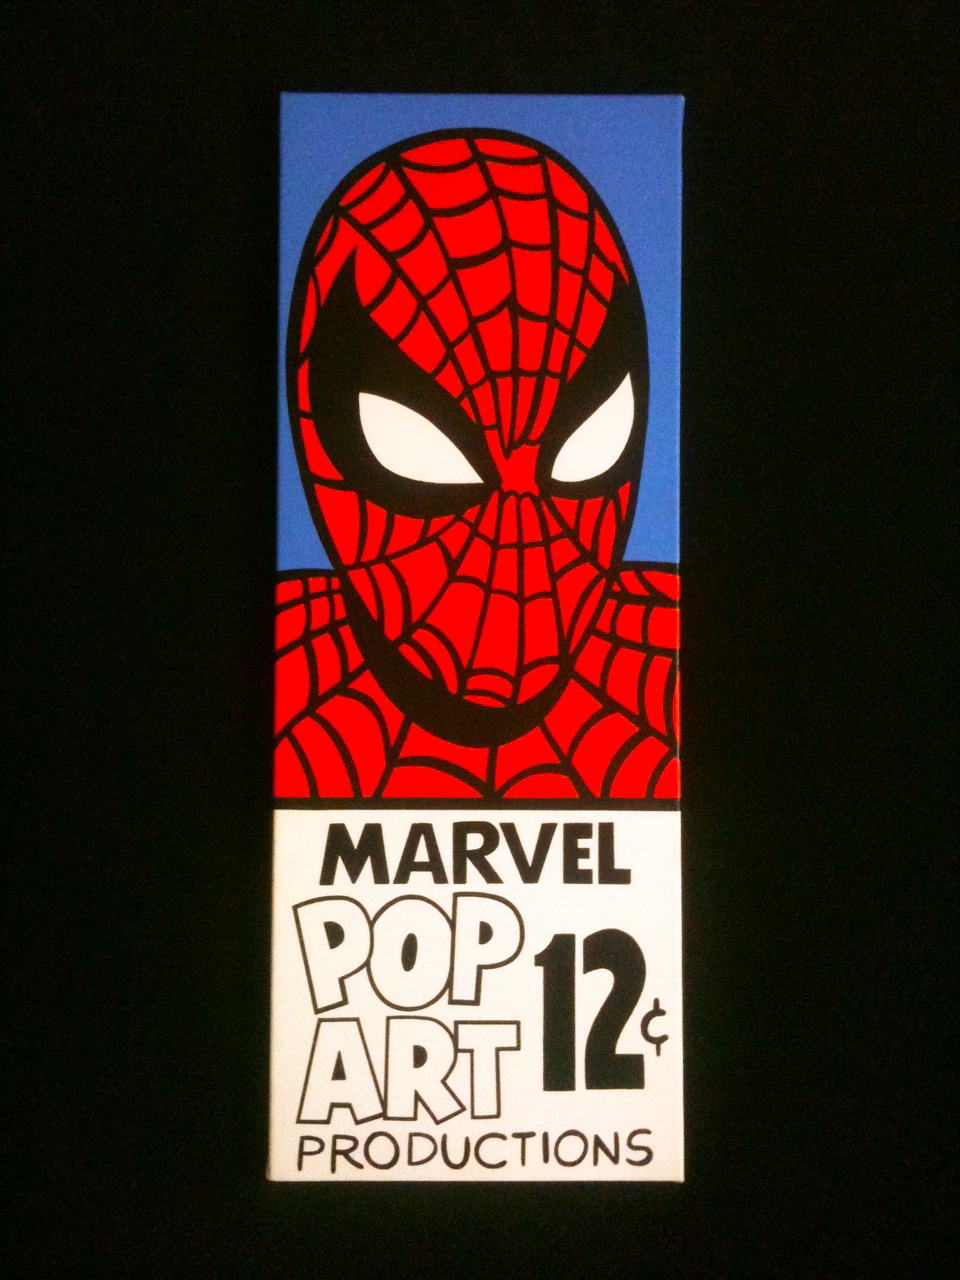 Spiderman cornerbox pop art 6x12 acrylic painting